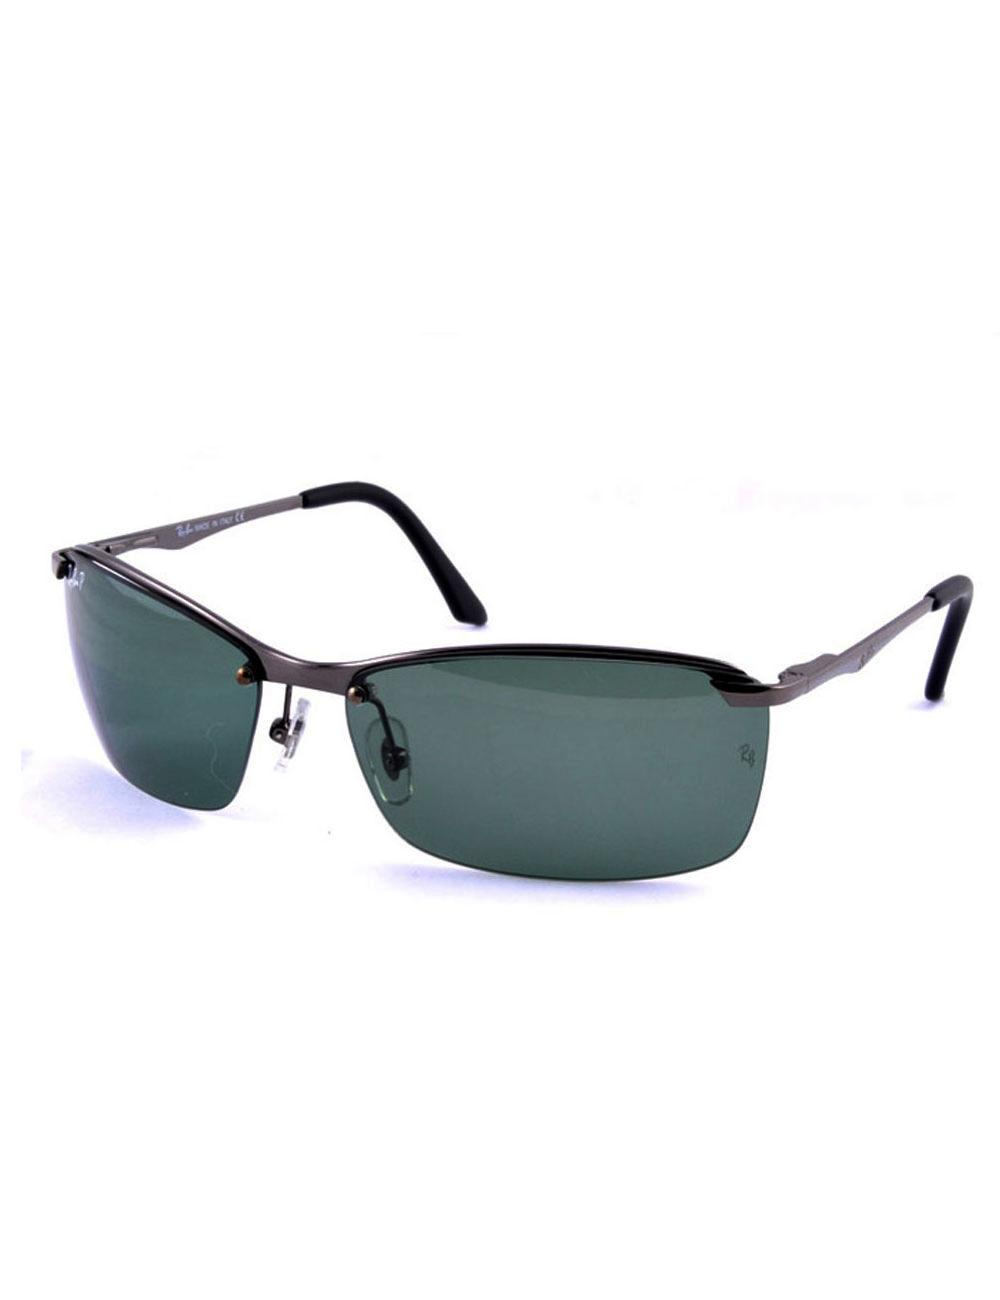 6fba5c4ad3a Ray Ban 3308 Sunglasses  Brand   RayBan Model   RB 3308 Lens Color   Blue